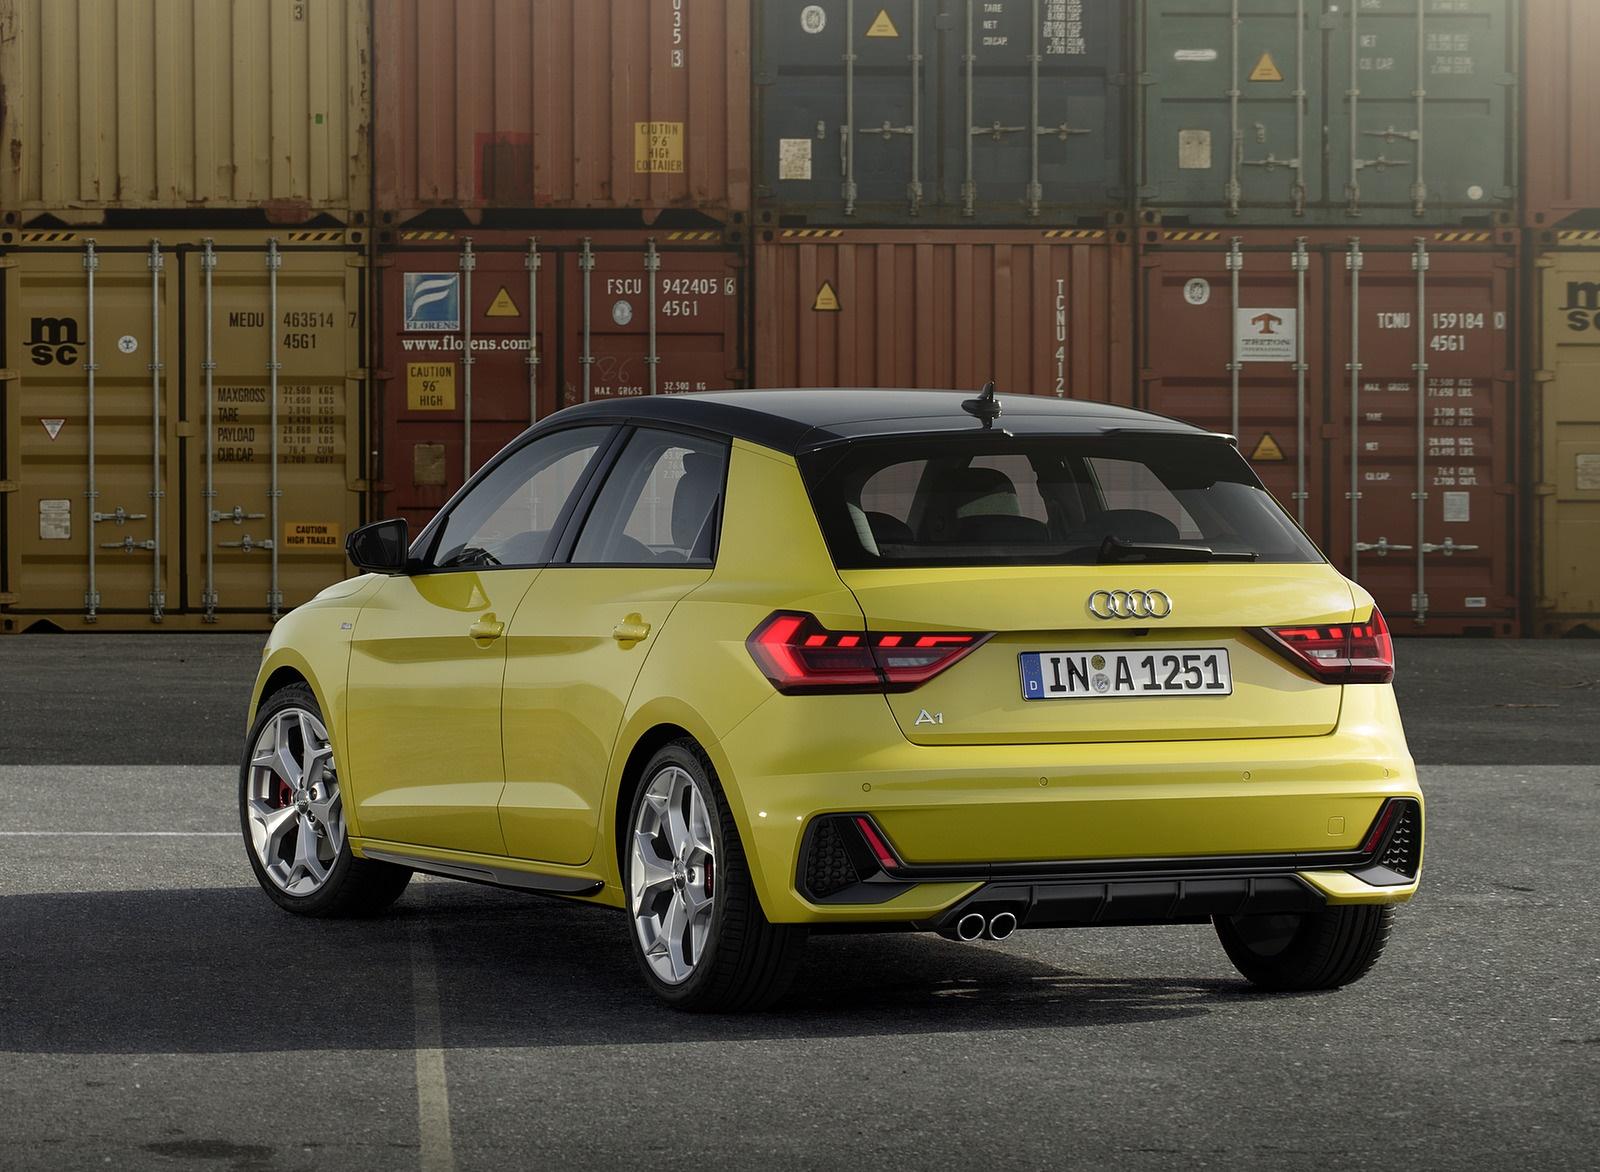 2019 Audi A1 Sportback (Color: Python Yellow) Rear Three-Quarter Wallpapers (13)